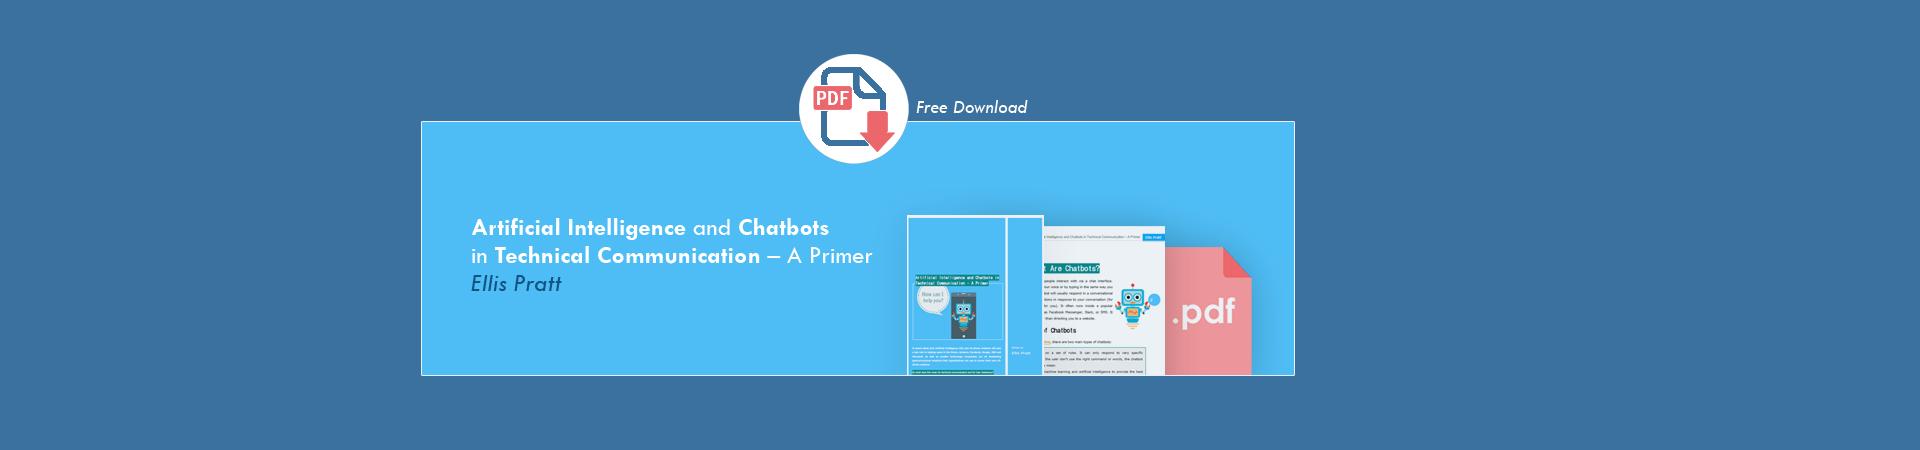 pdf-free-download-chatbots-and-ai